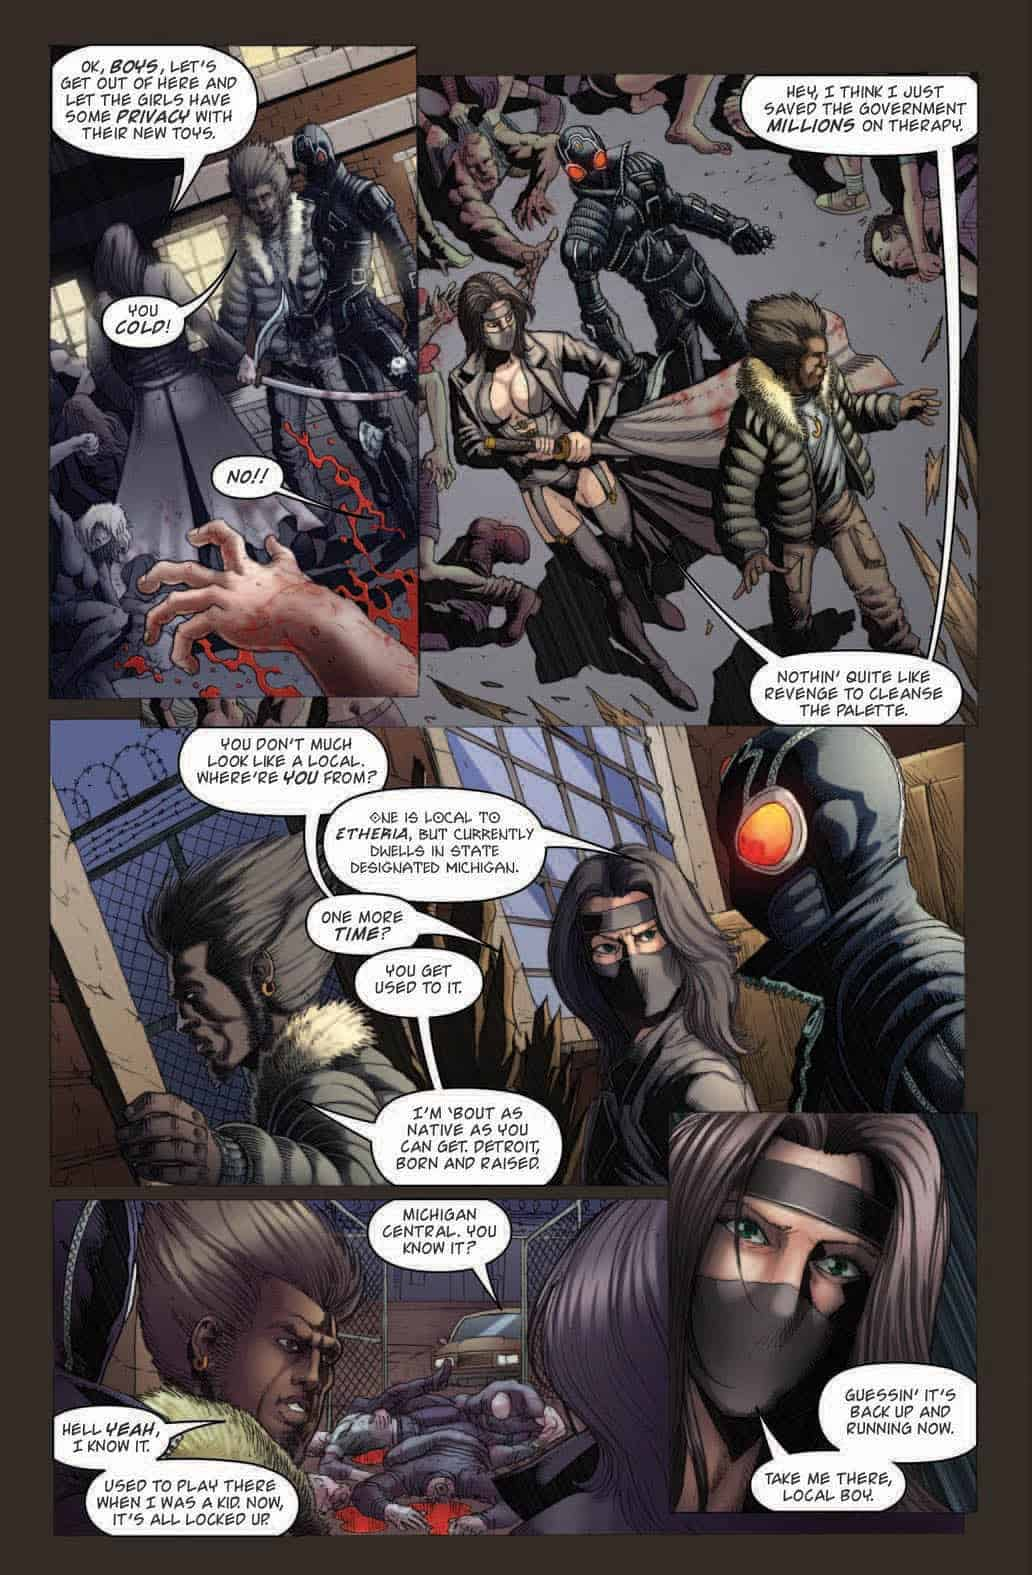 Simmons-Comics-Anthology-Vol-2-image-04